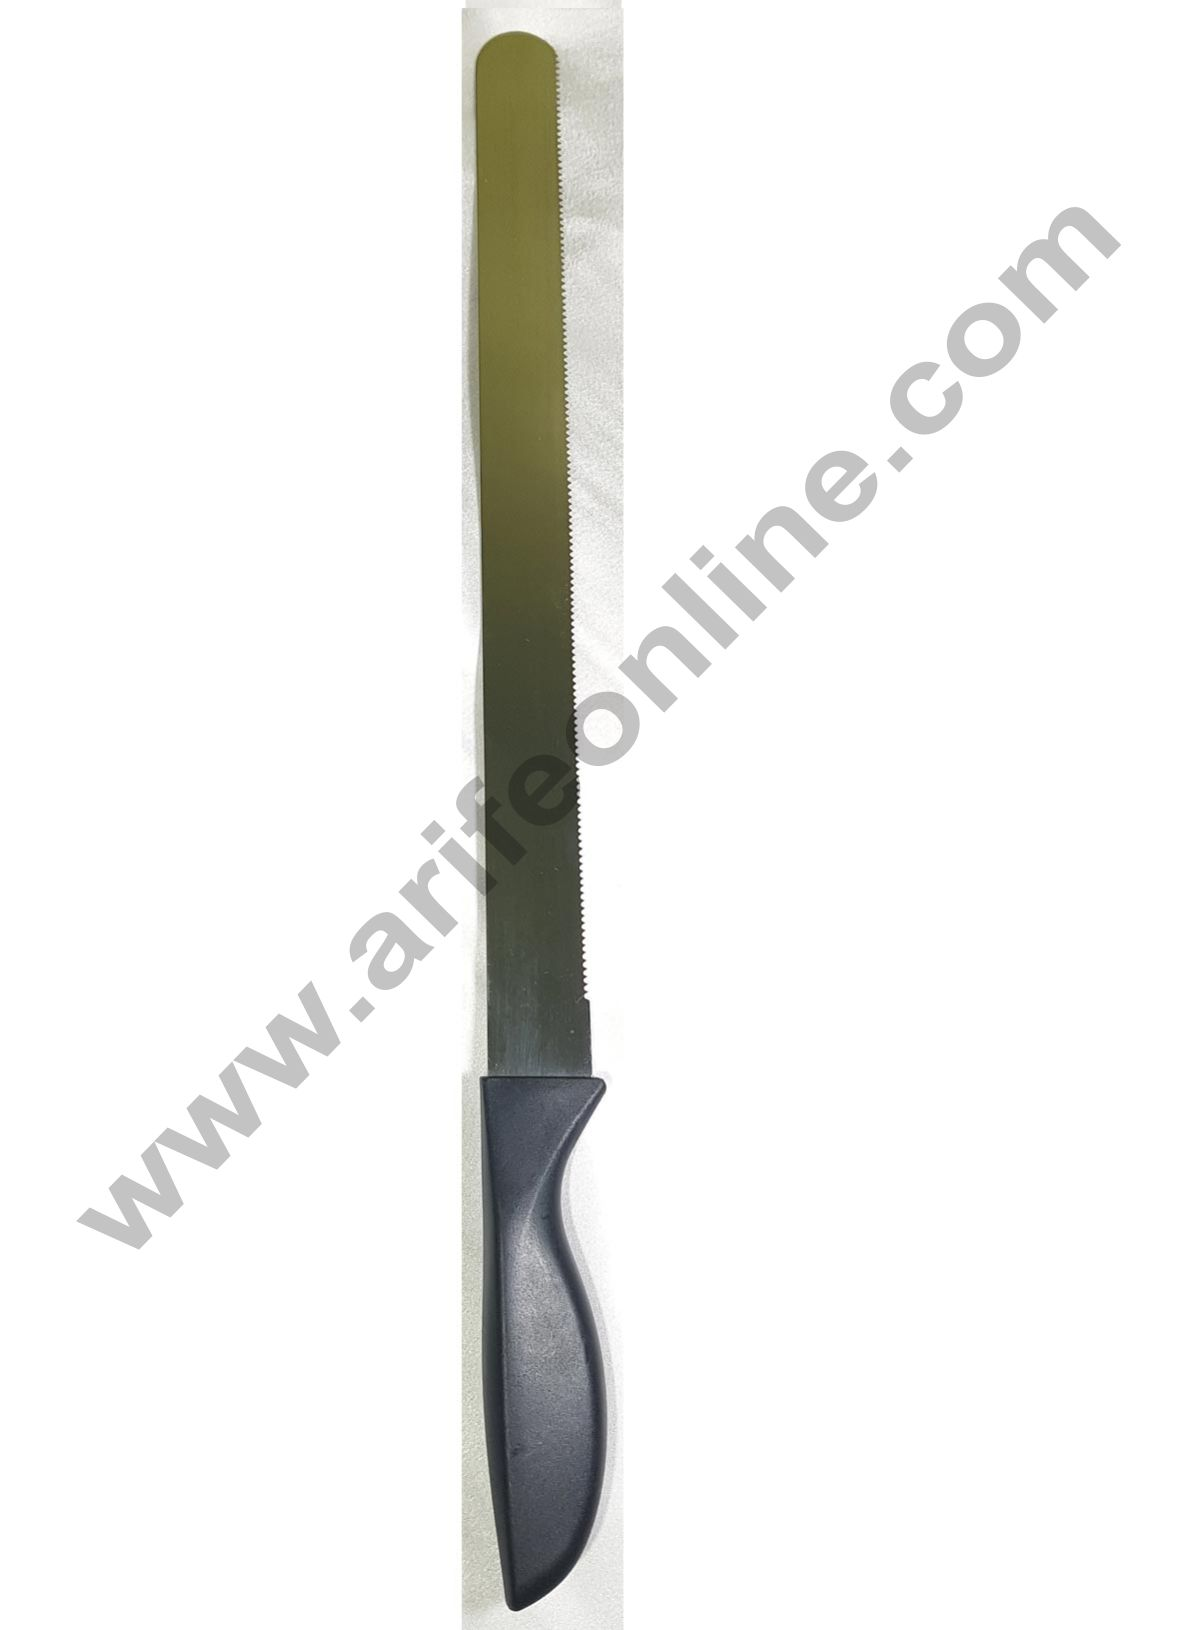 Cake Decor Straight Spatula Serrated Knife,Combo Cake Pallate Knife-10inch/1pieces